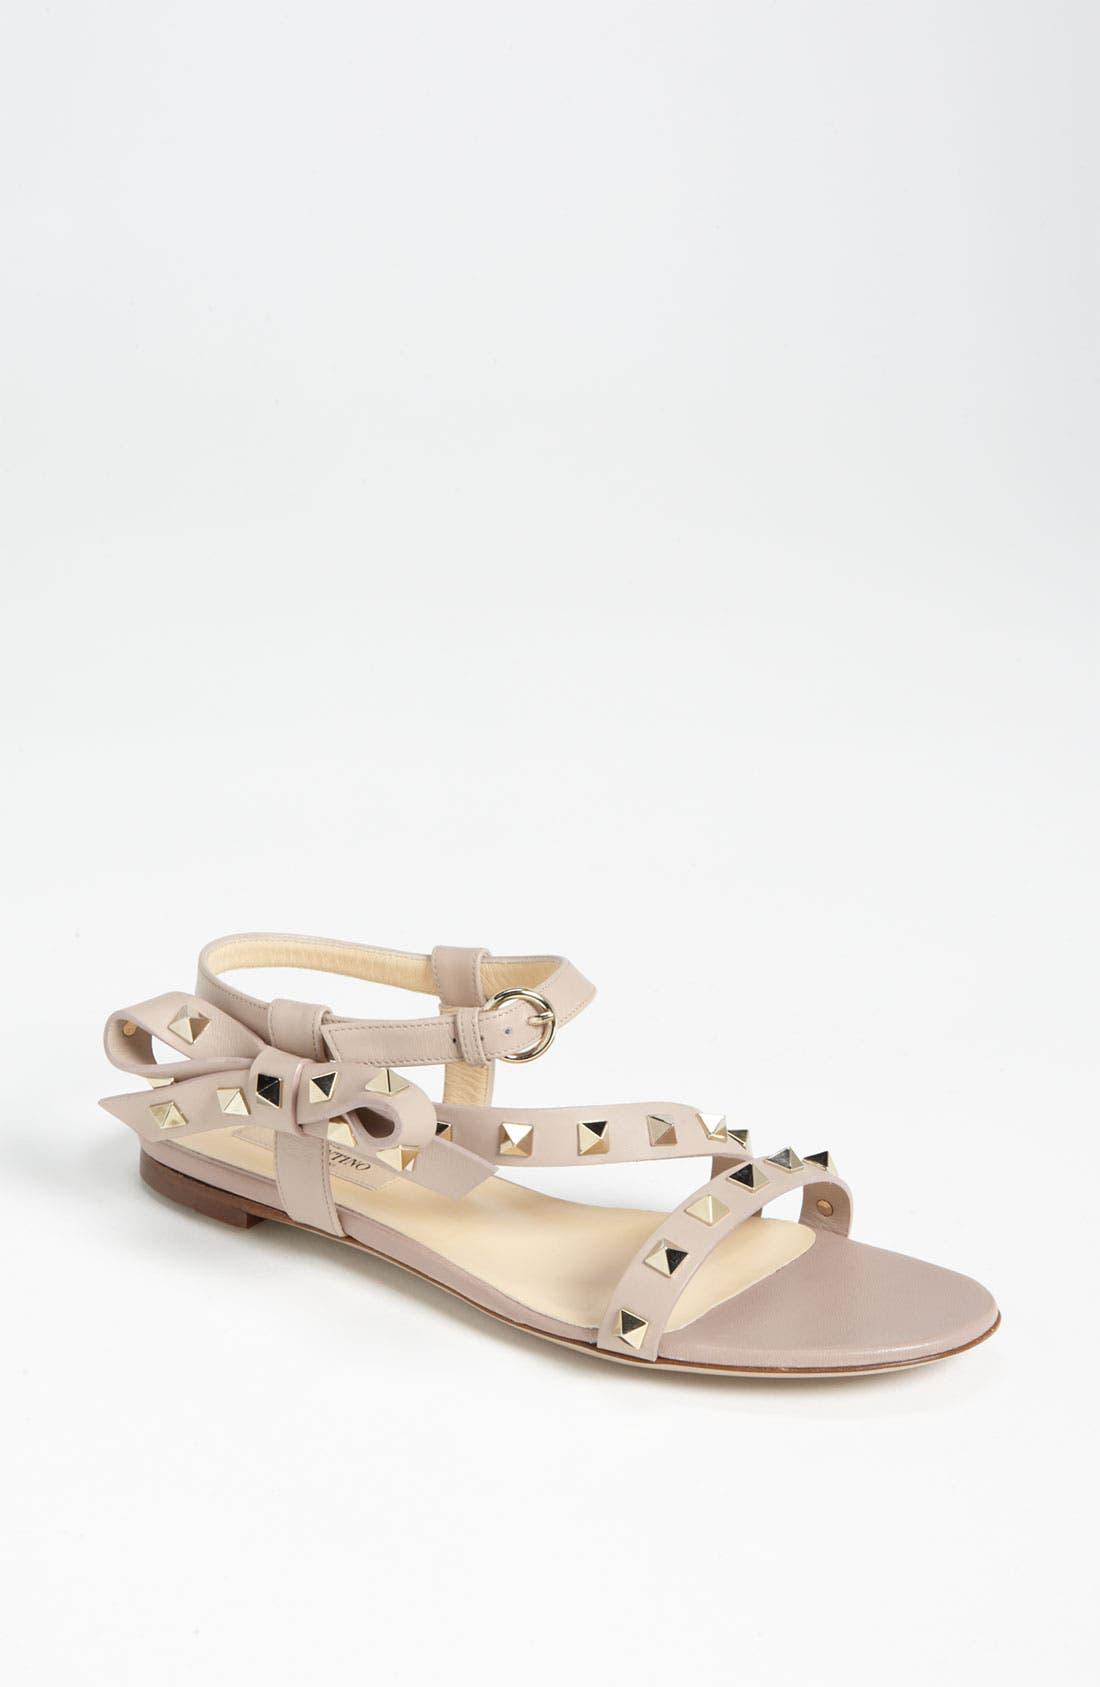 Main Image - VALENTINO GARAVANI 'Rockstud' Bow Flat Sandal